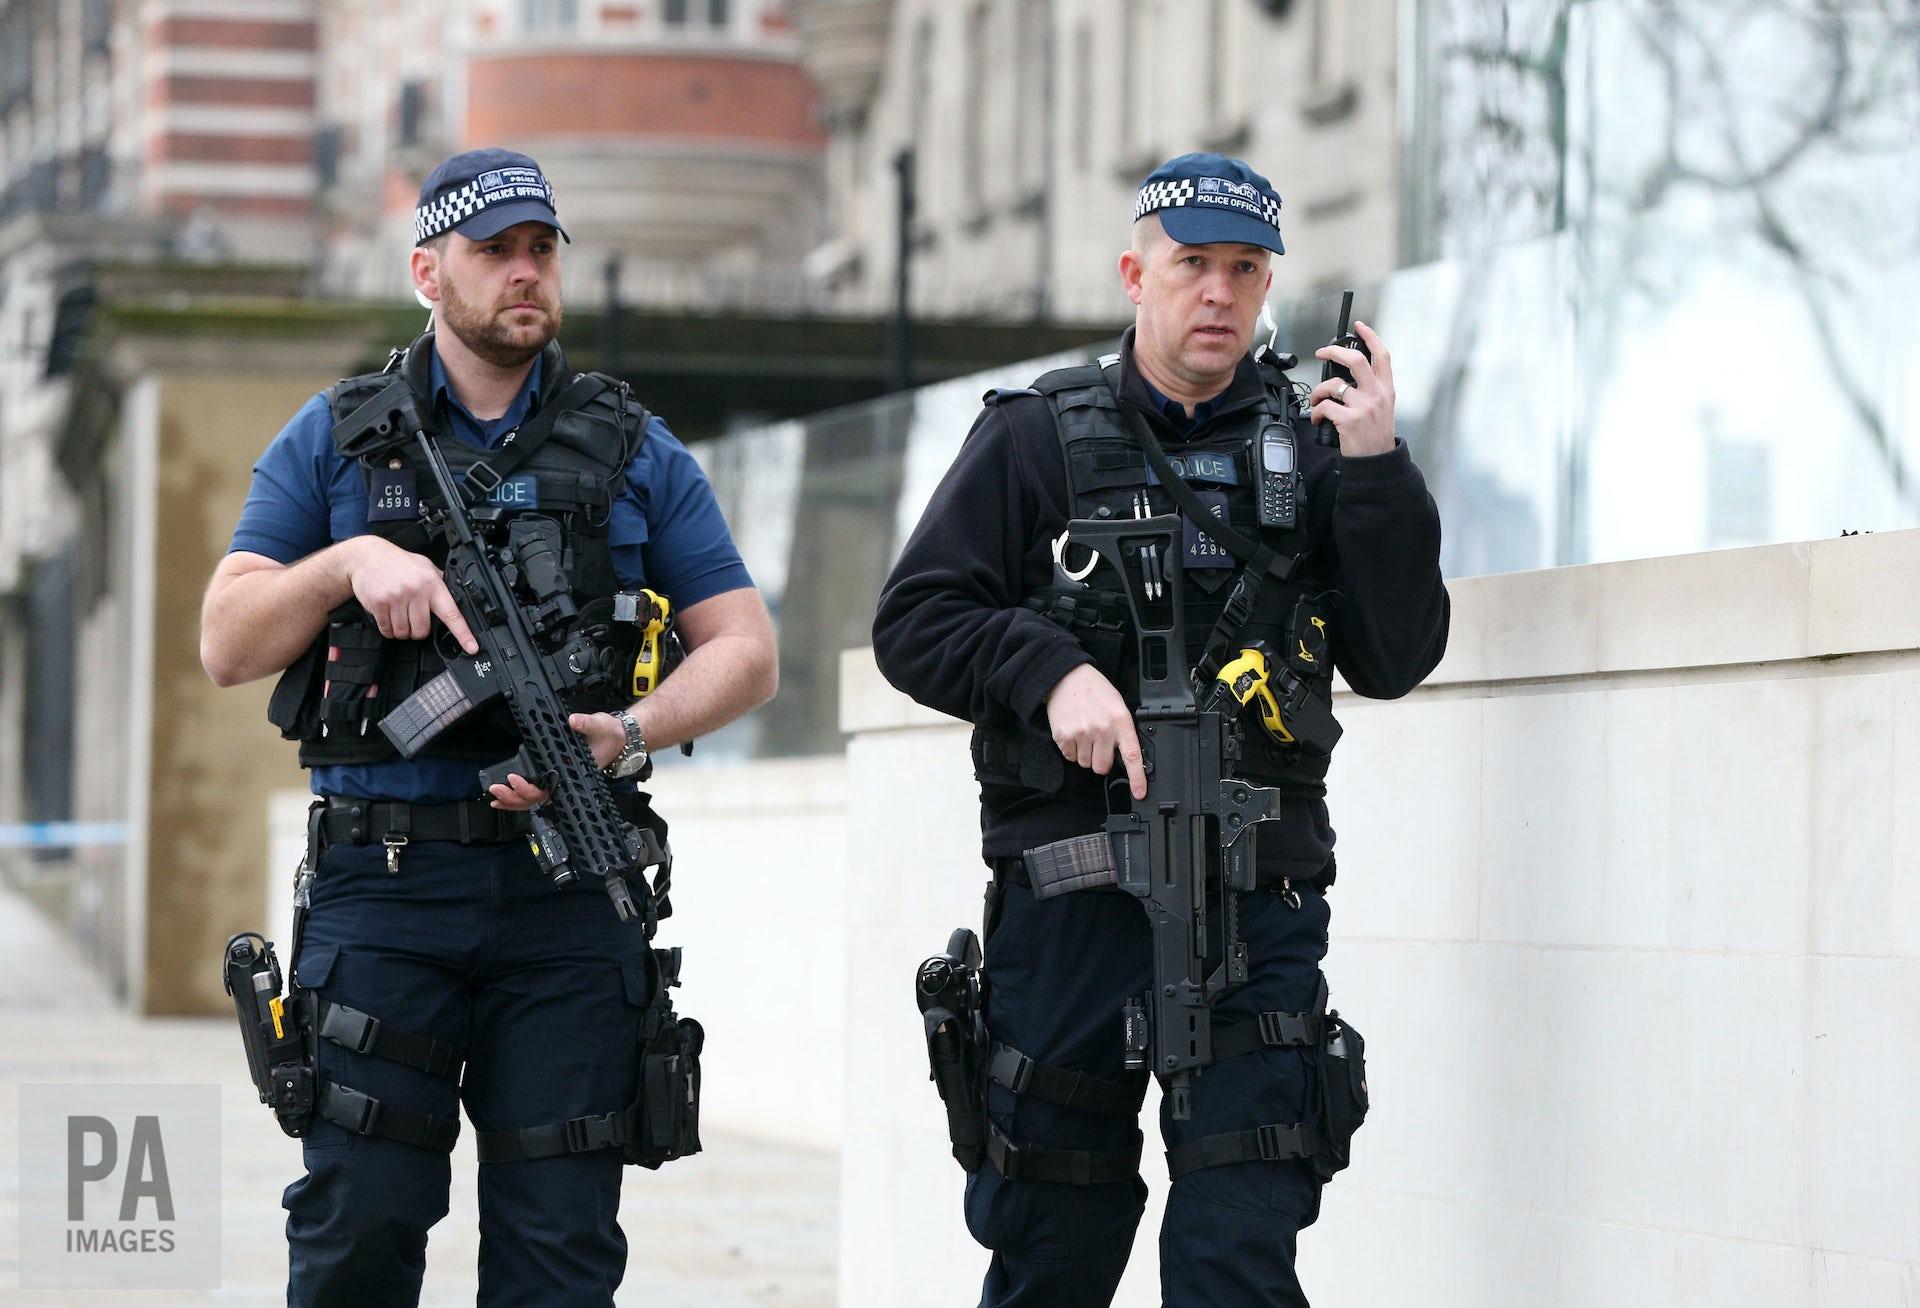 English police officer uniform